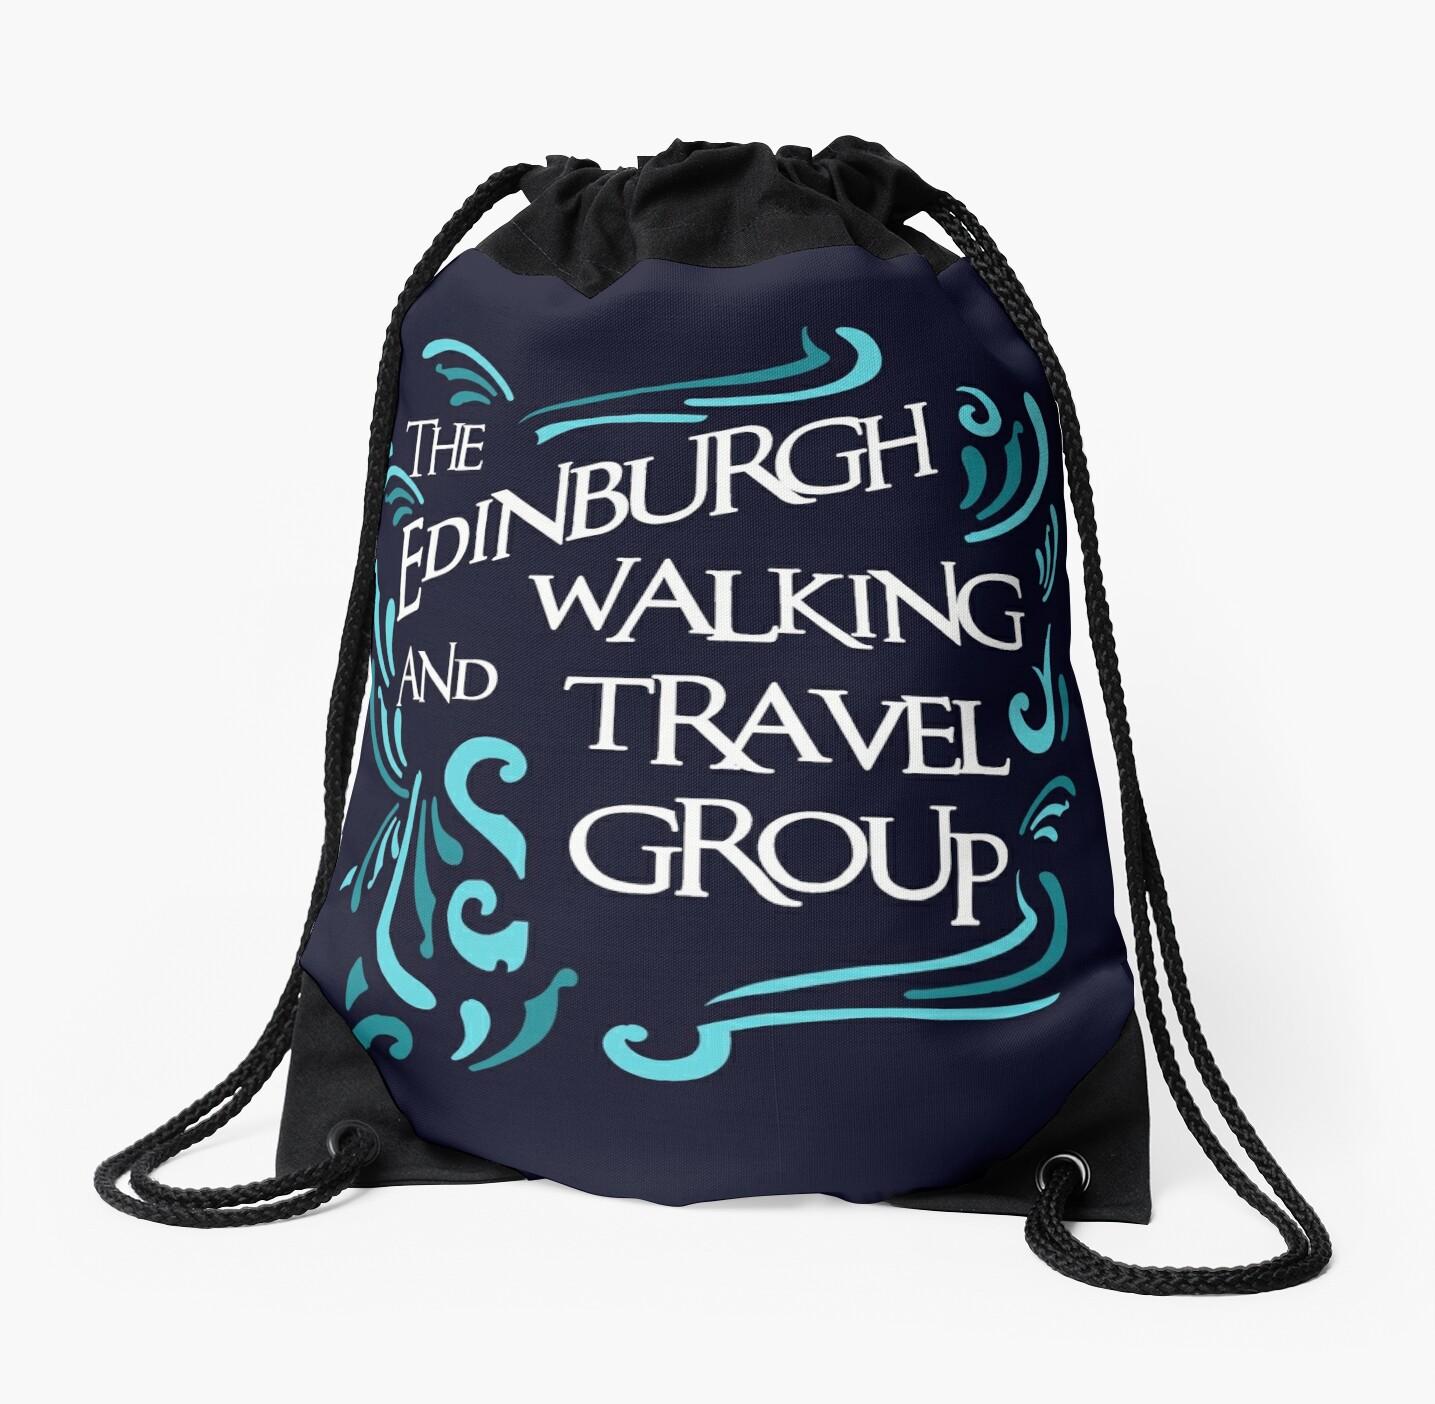 The Edinburgh Walking and Travel Group by JCumming